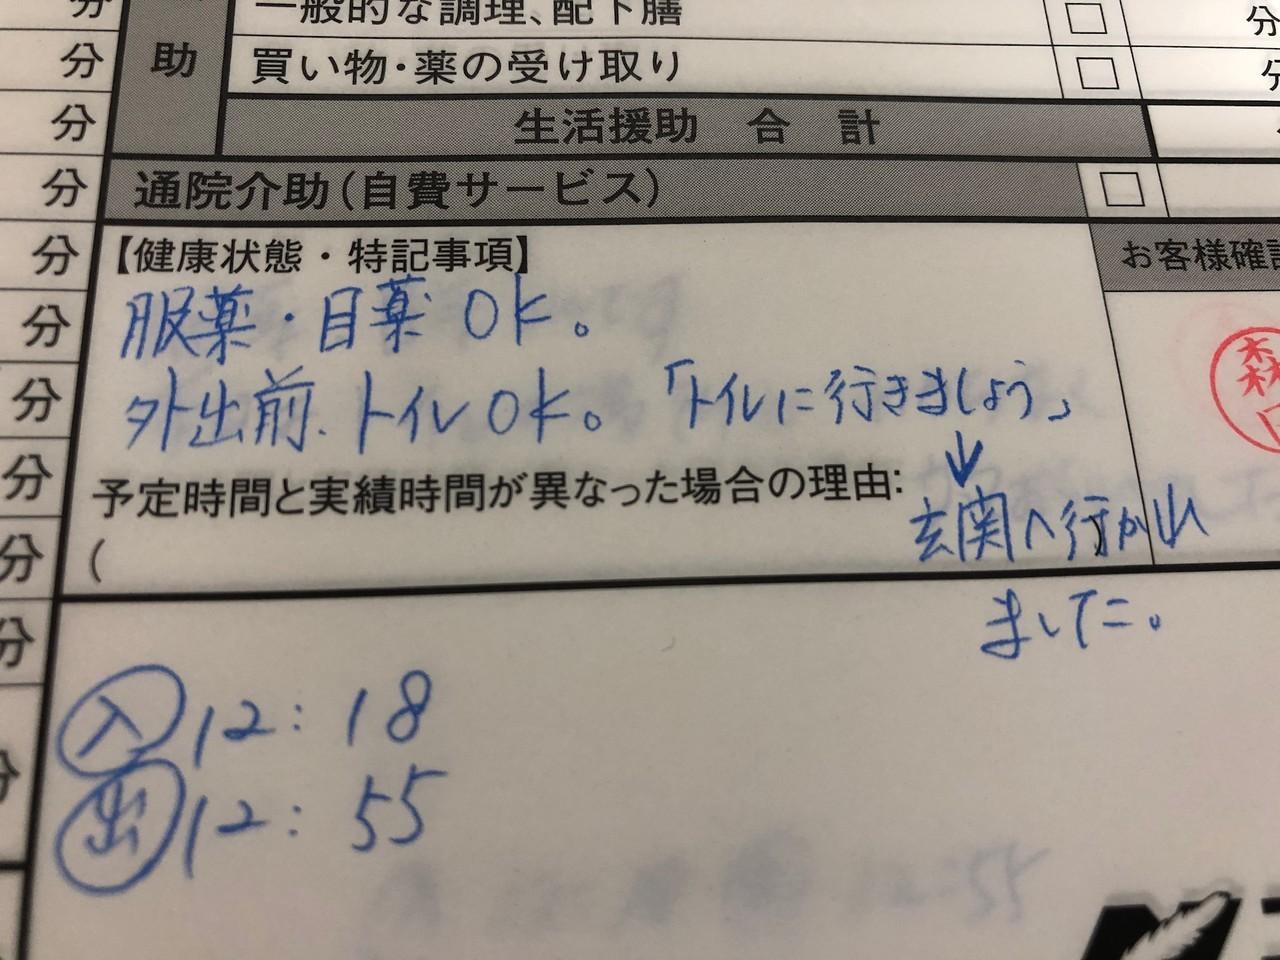 f:id:moritashigeru:20200212212635j:plain